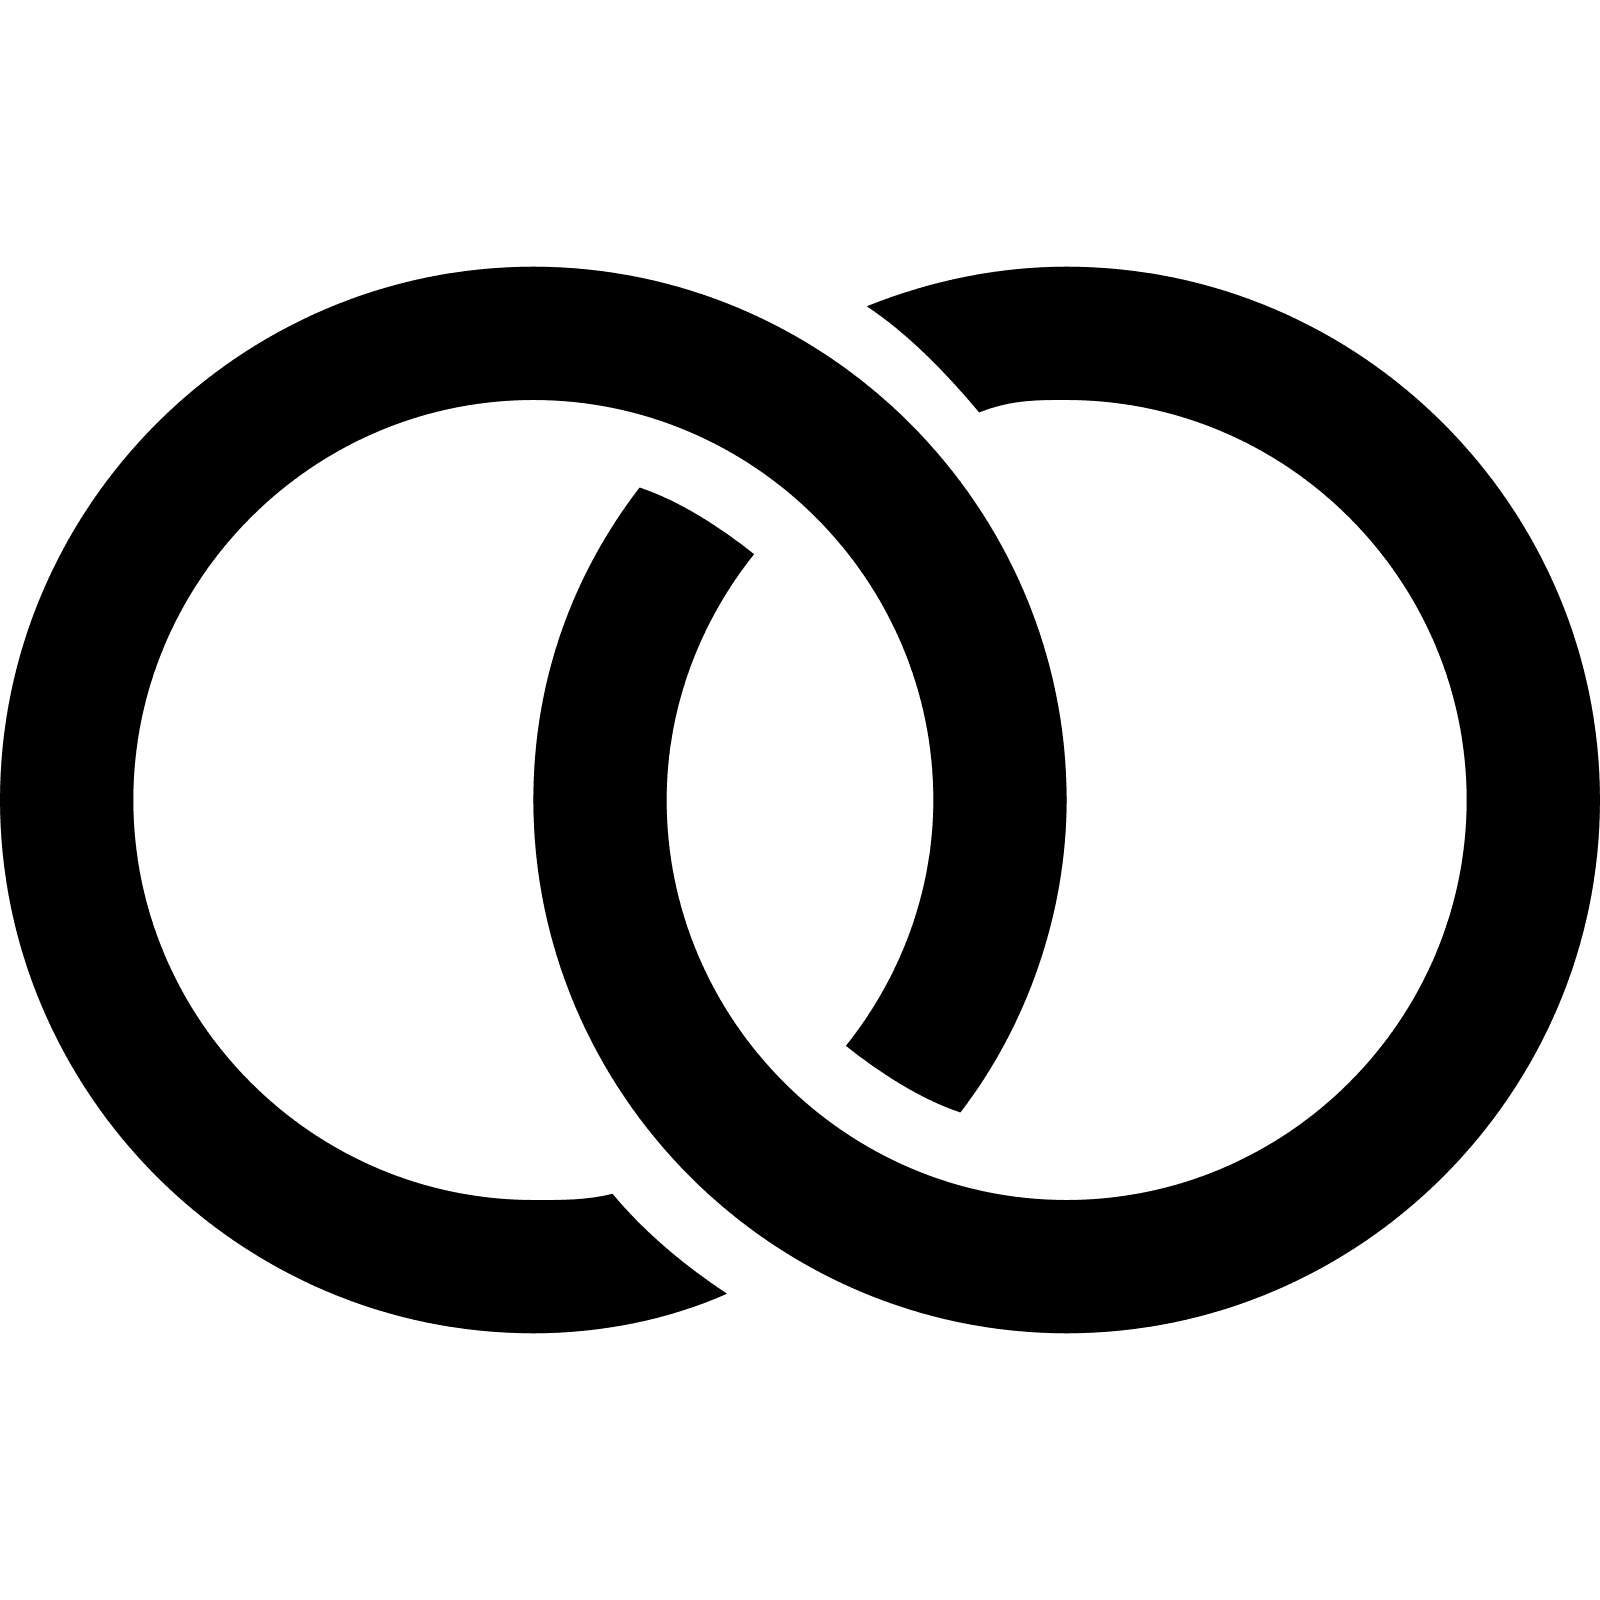 verheiratet symbol